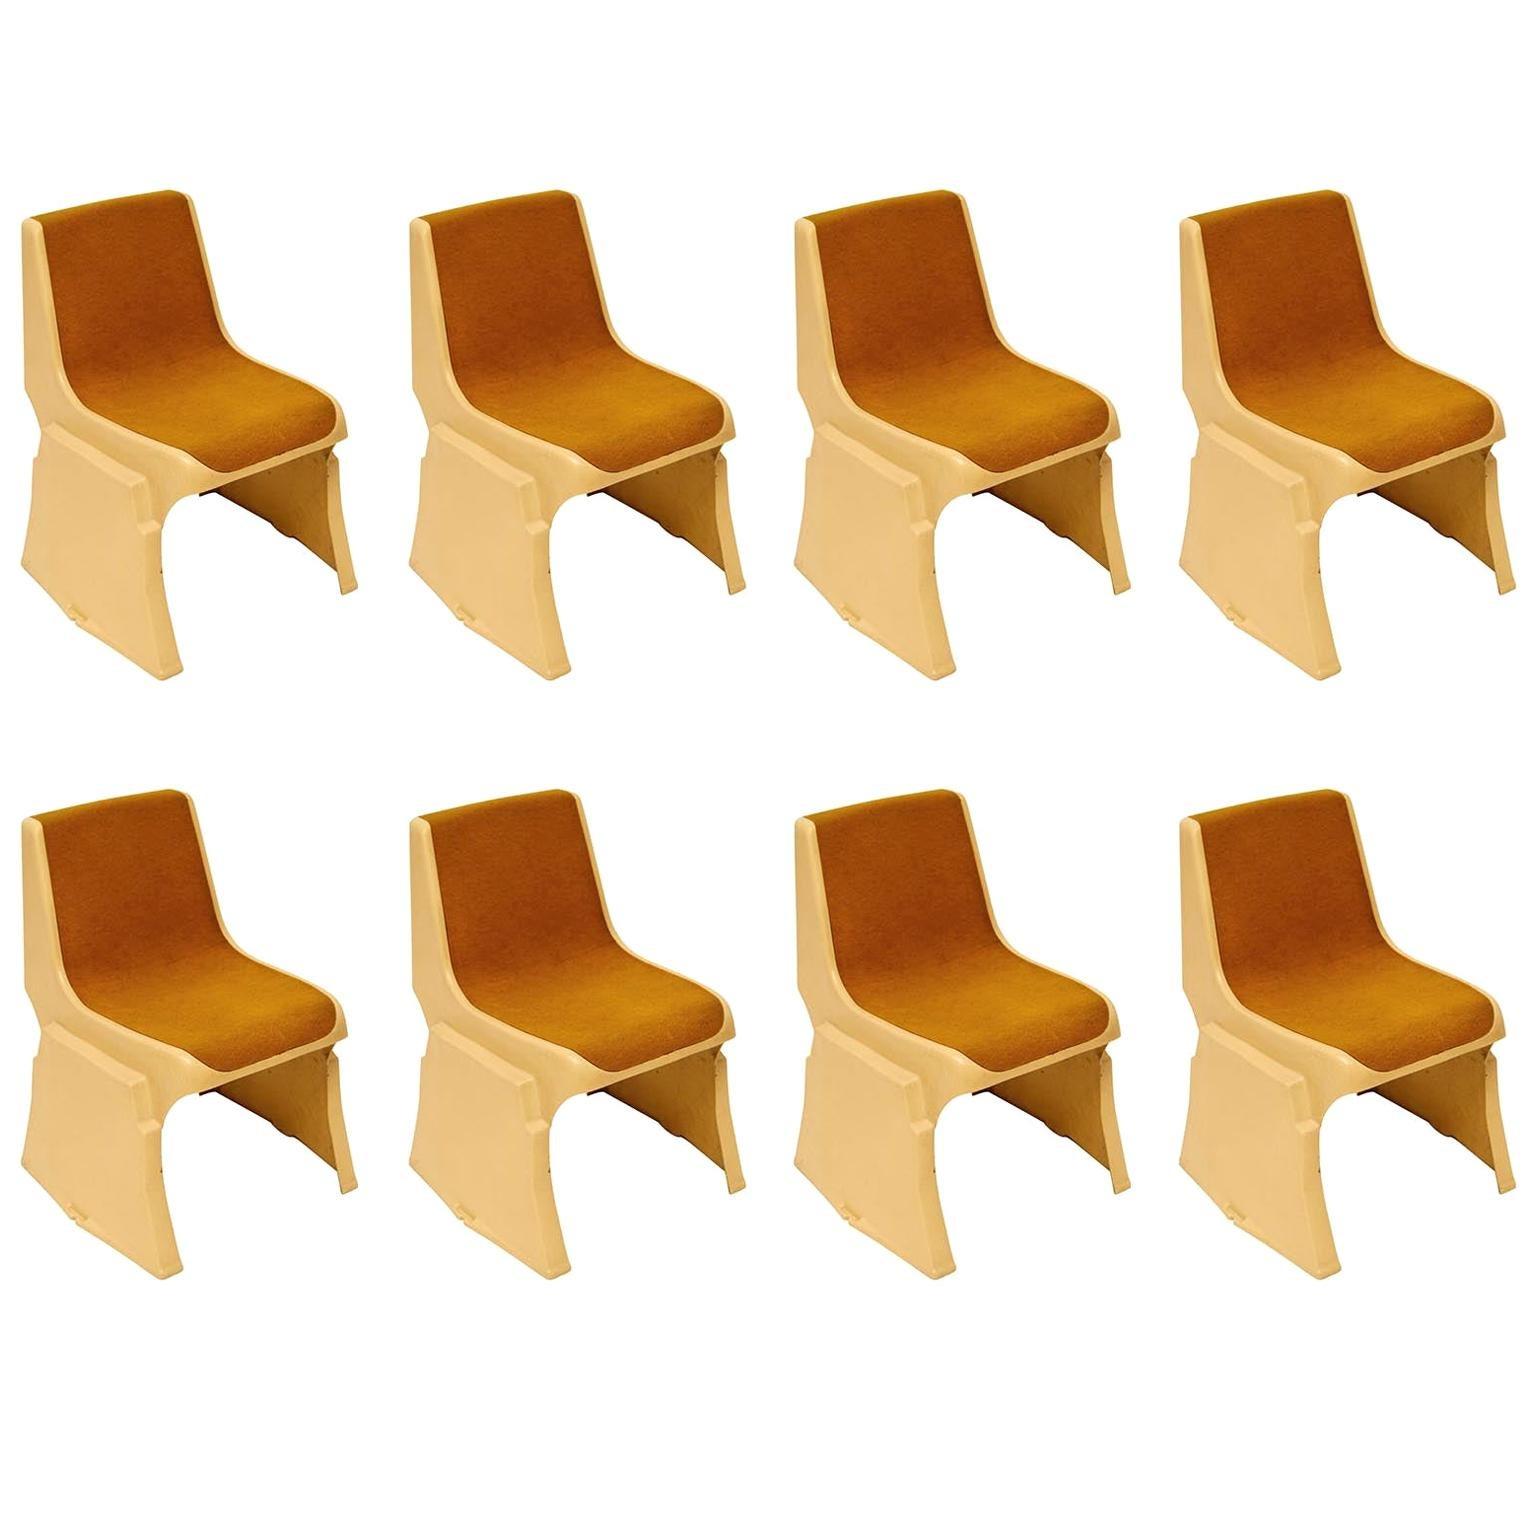 Set Eight Brutalist Fiberglass Stacking Chairs, Günther Domenig, Austria, 1970s